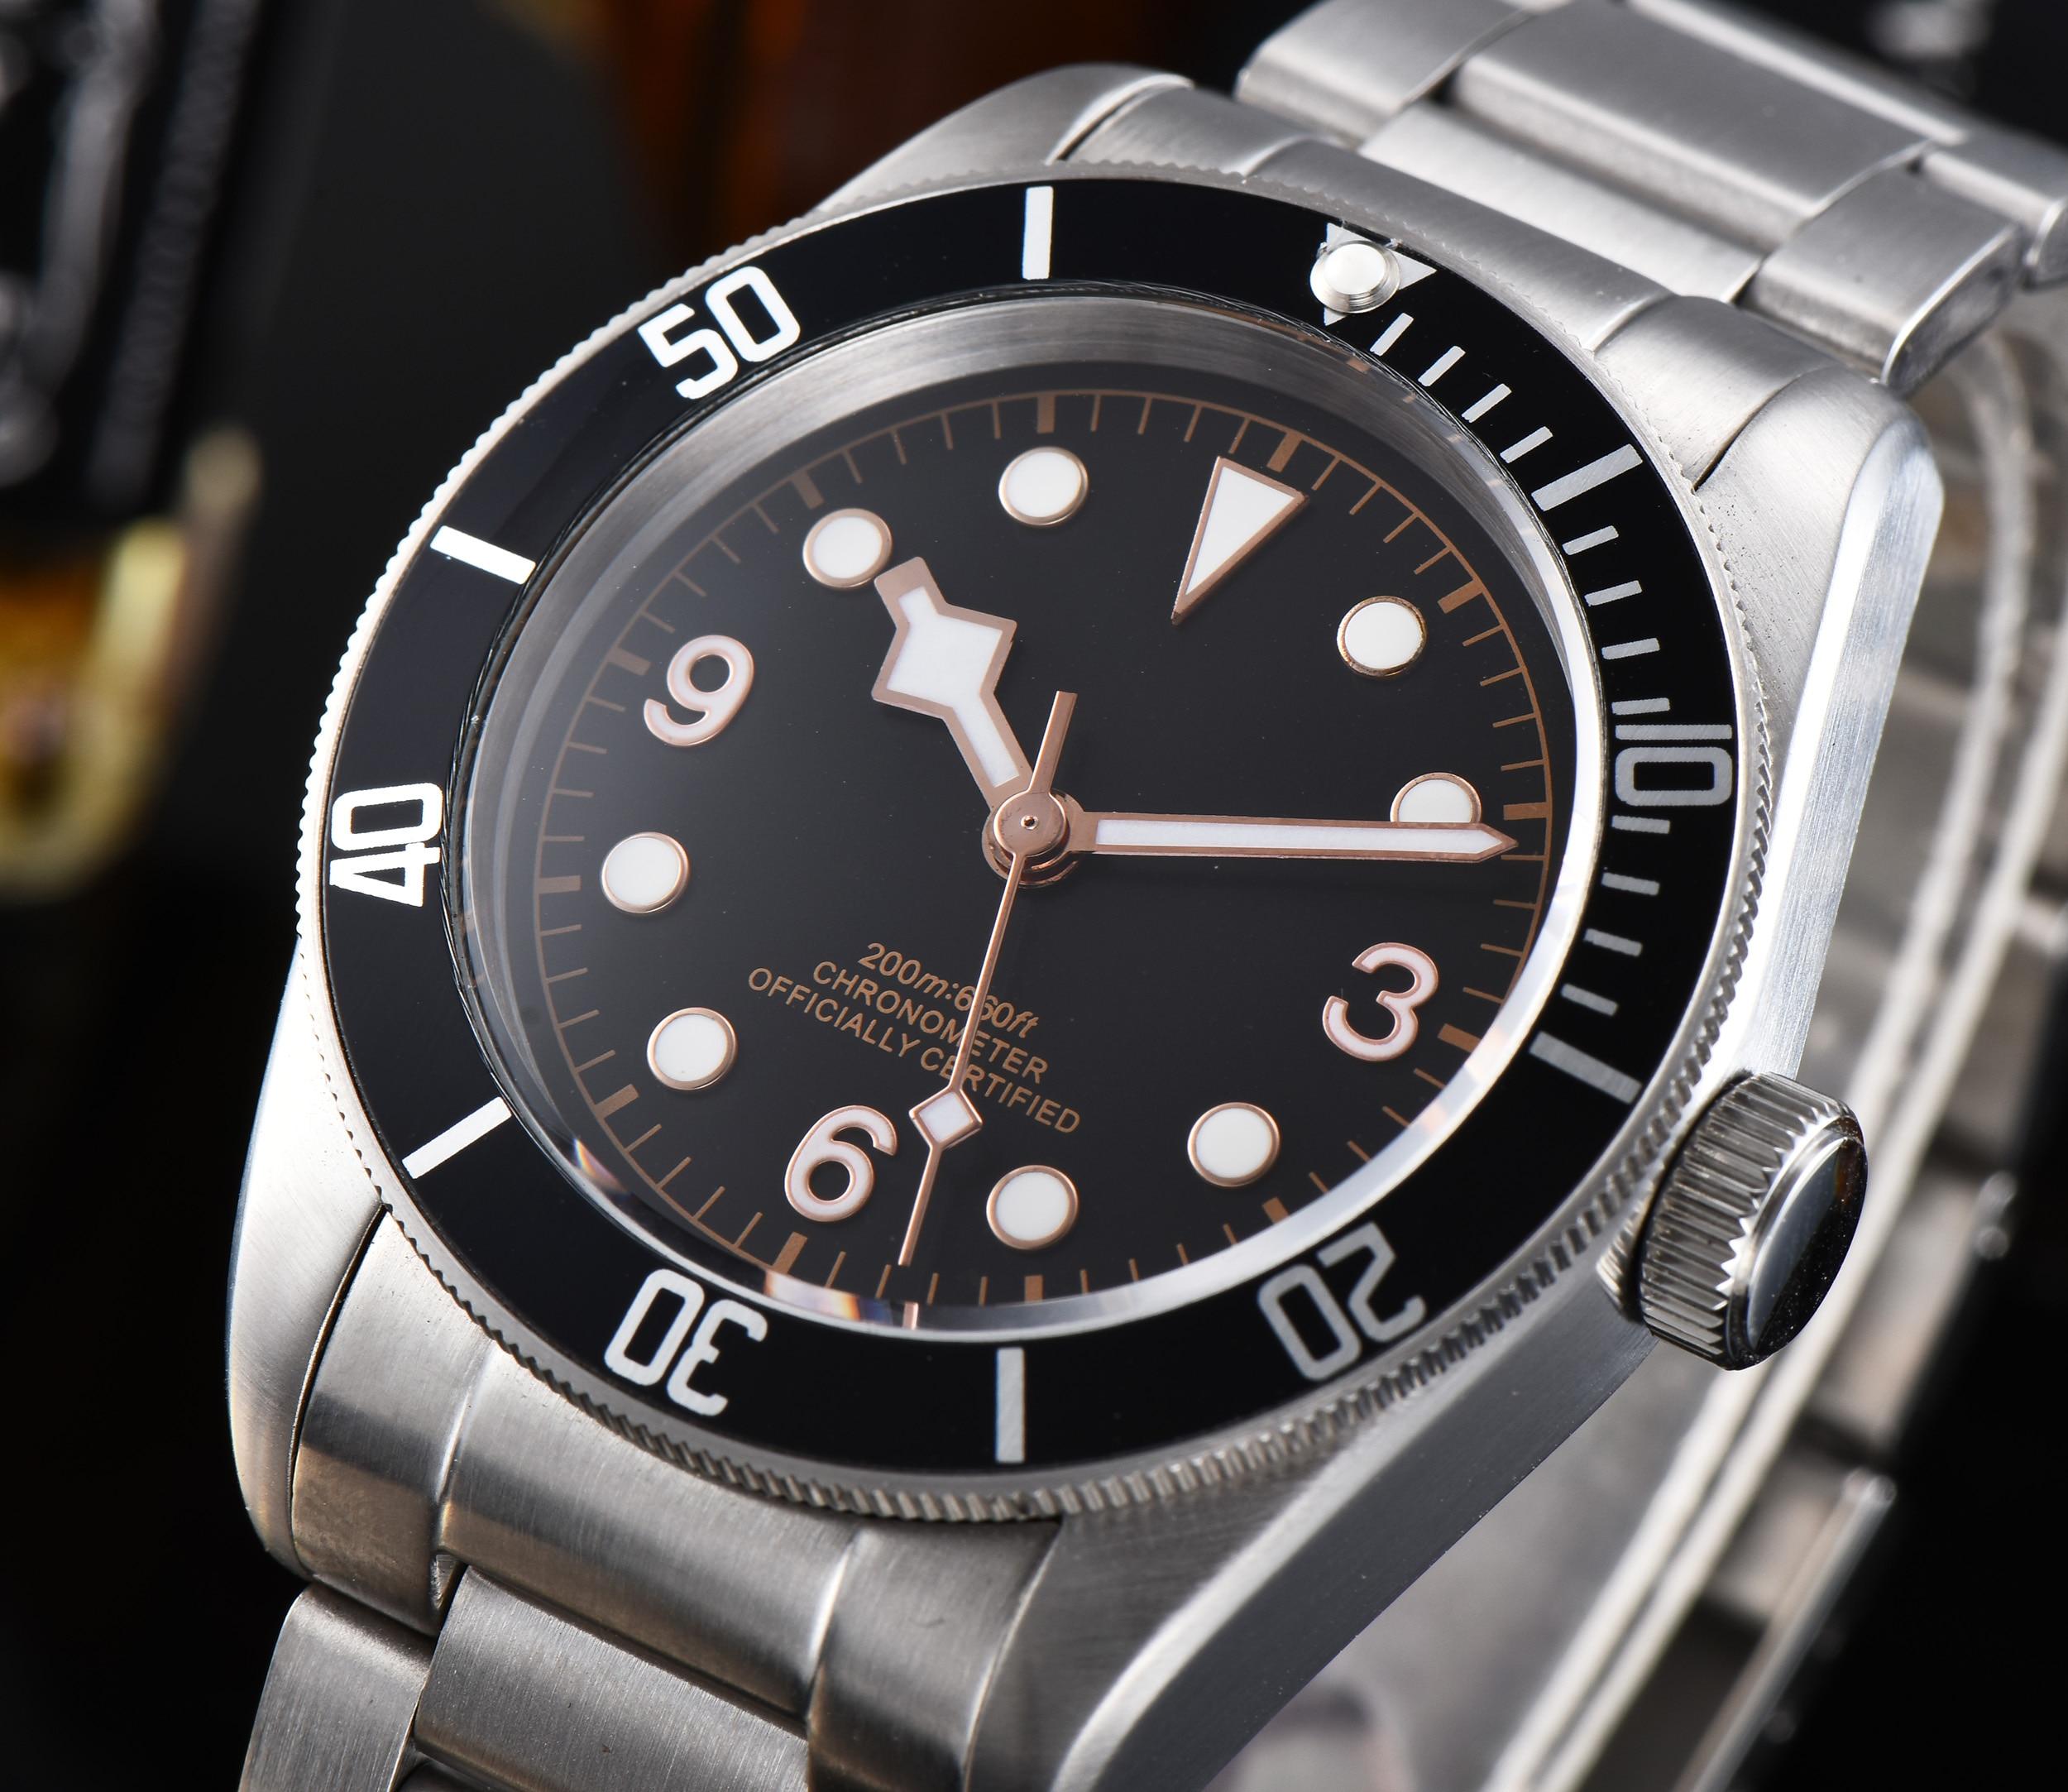 41mm corgeut lujo negro dial zafiro vidrio luminoso automático hombres Watc.